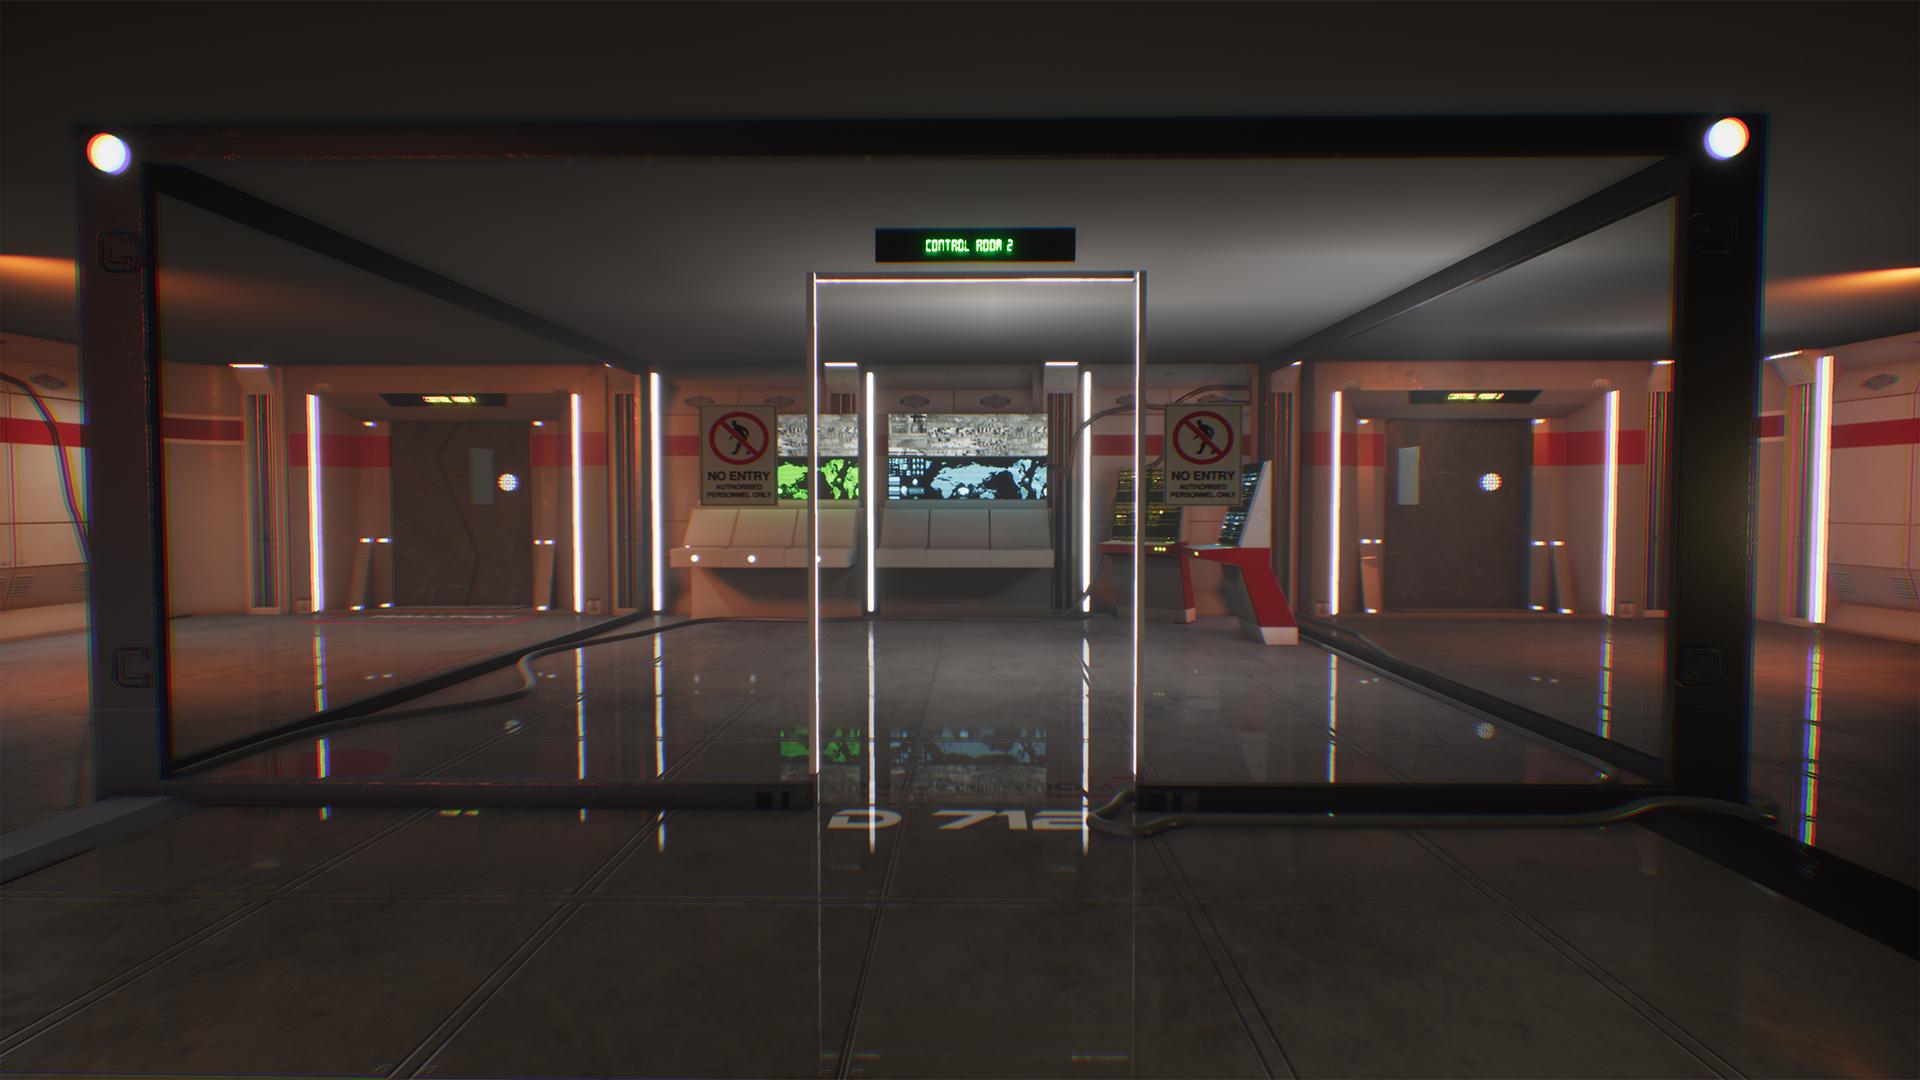 Sci-fi Control Room